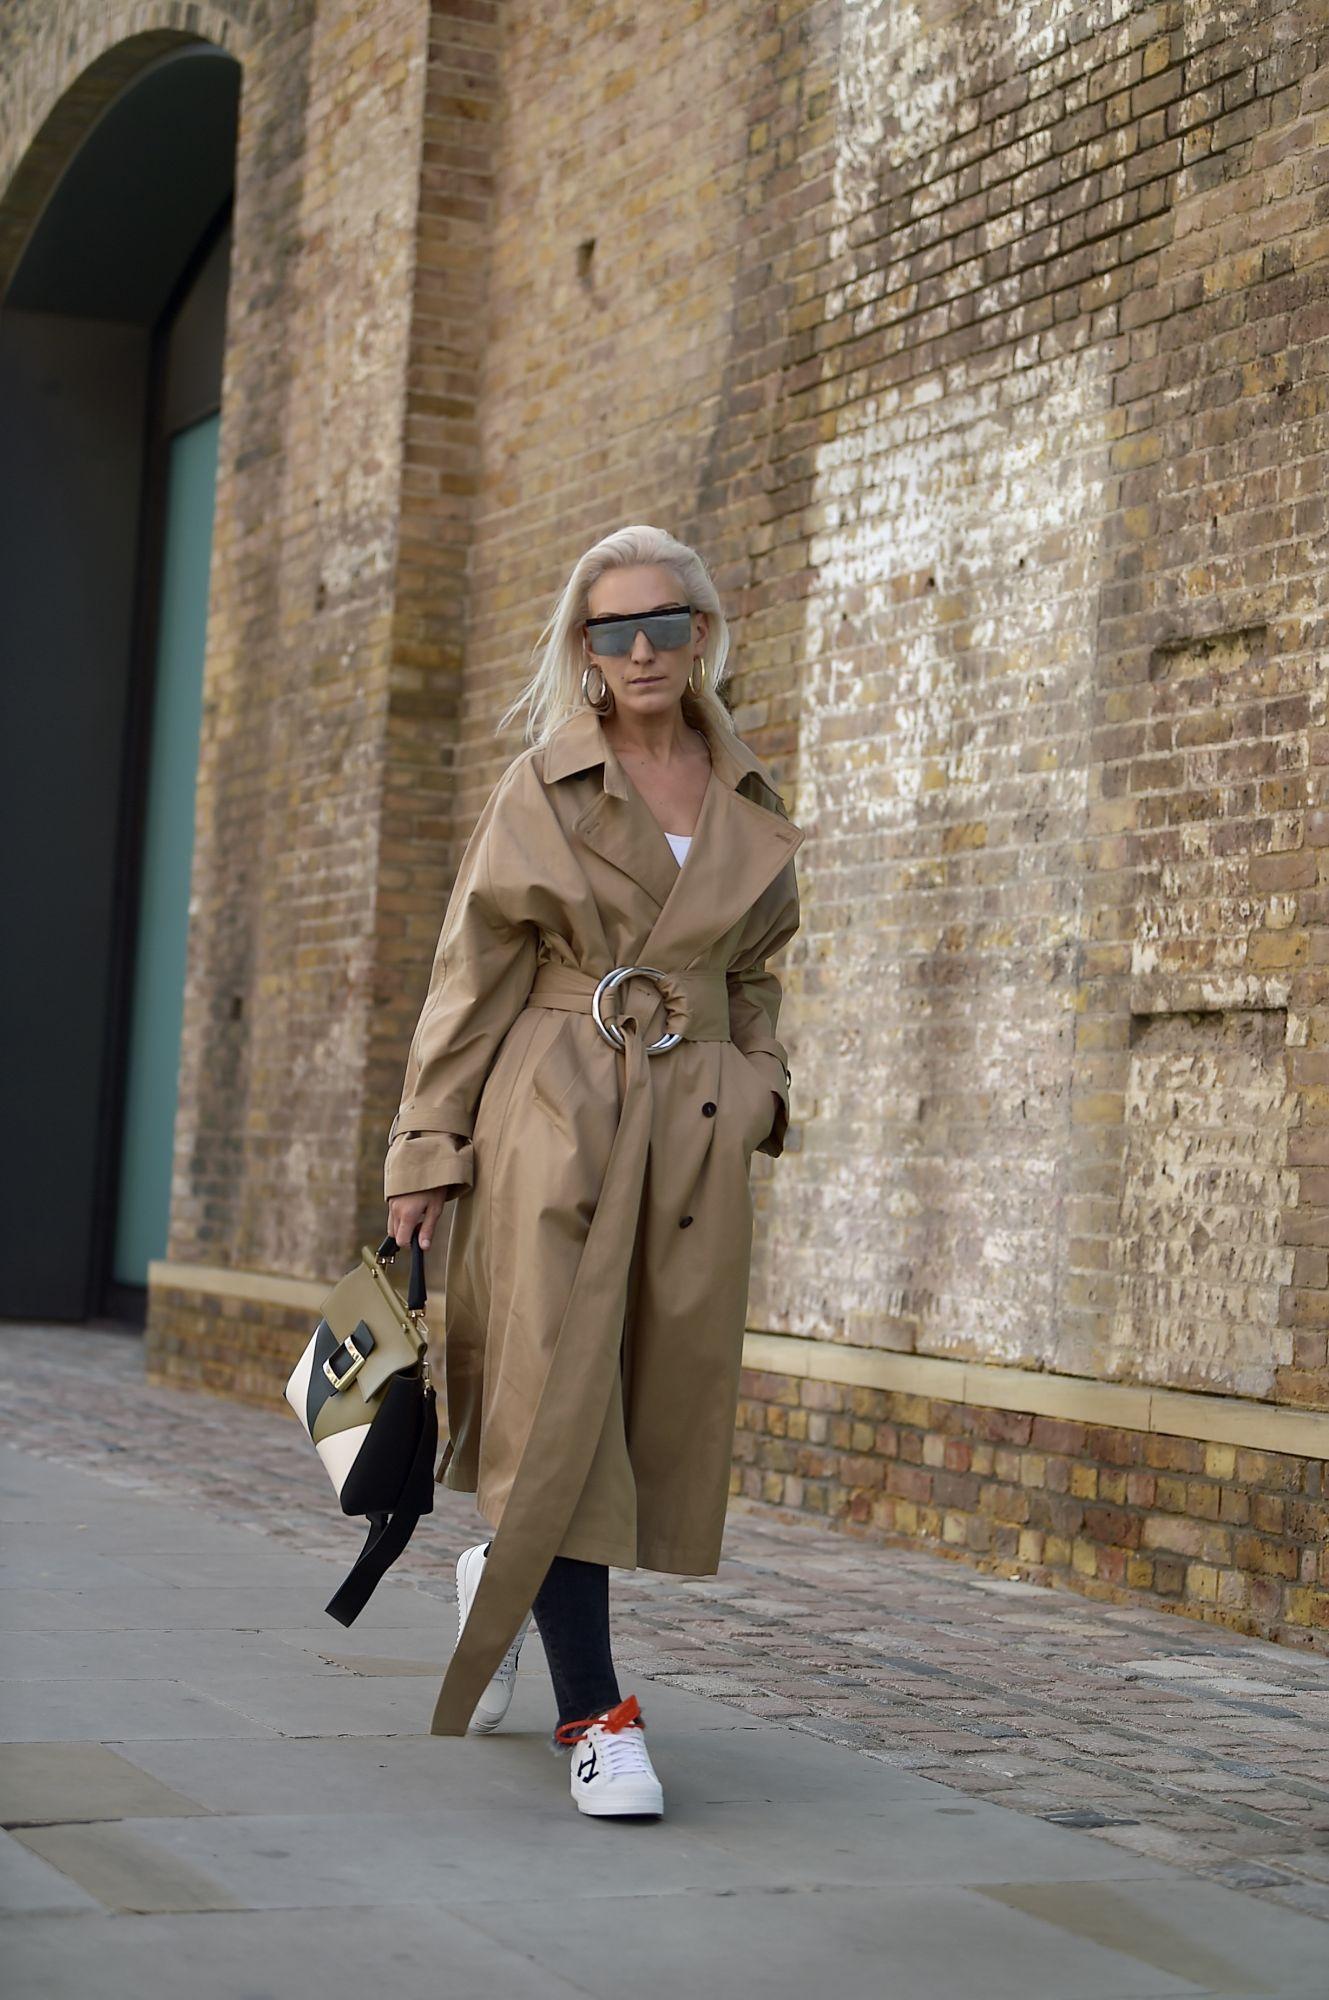 Olivia Buckingham Shares 10 Highlights From London Fashion Week